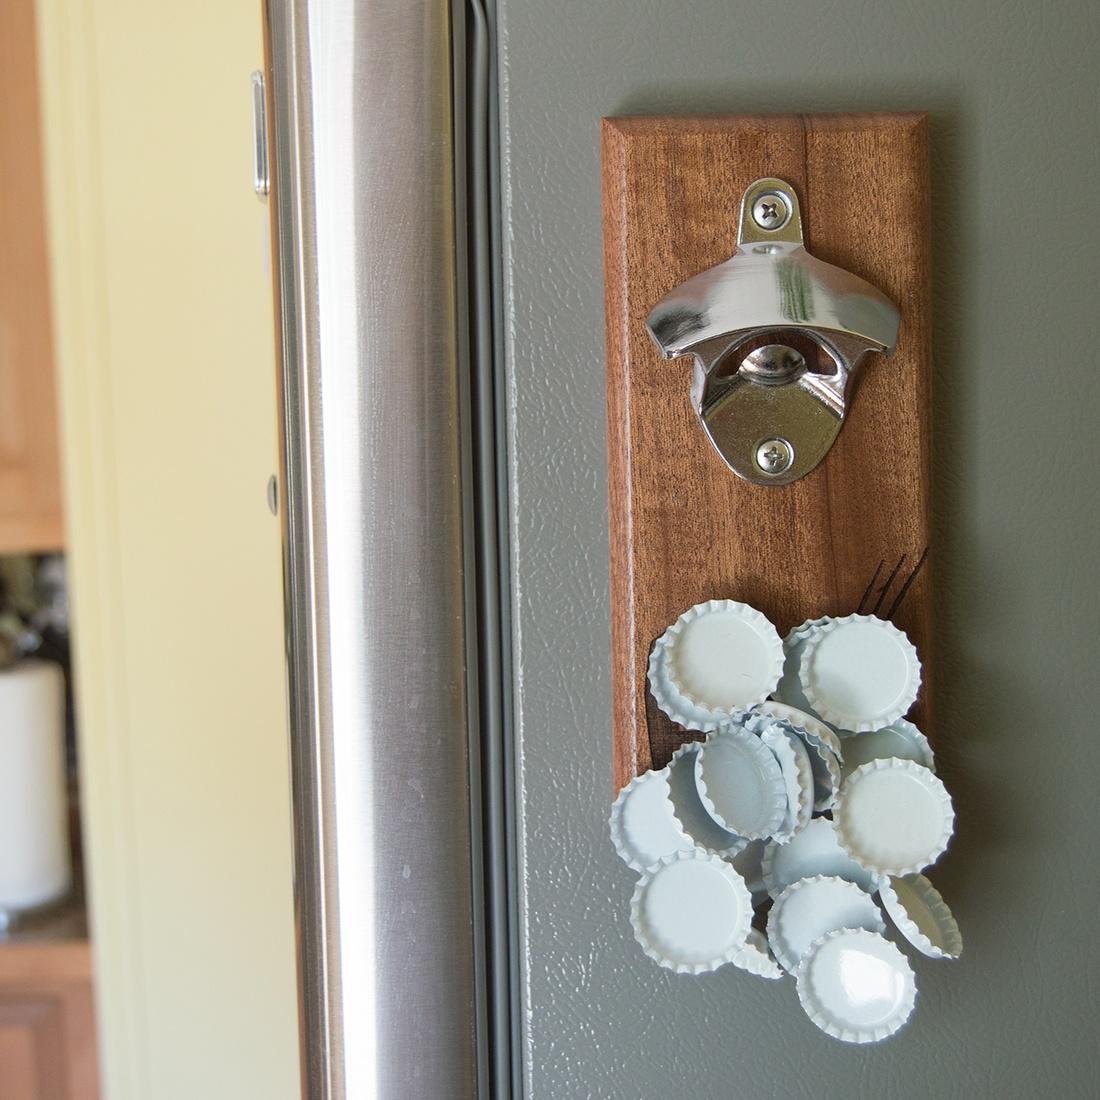 Nason's of Maine Magnetic Bottle Openers